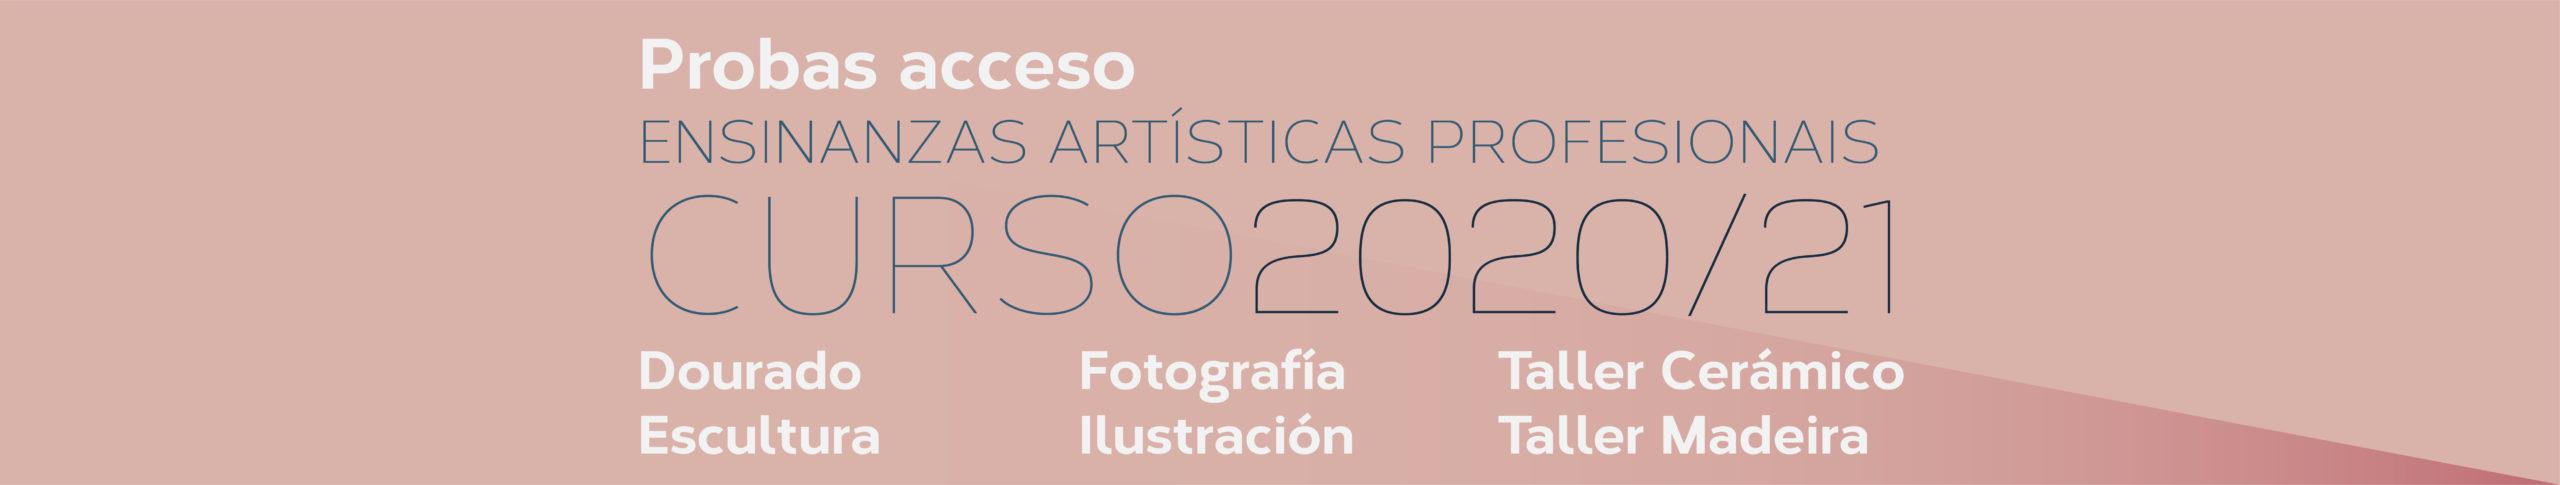 grafica_accesos_banner_eeaapp-06-scaled